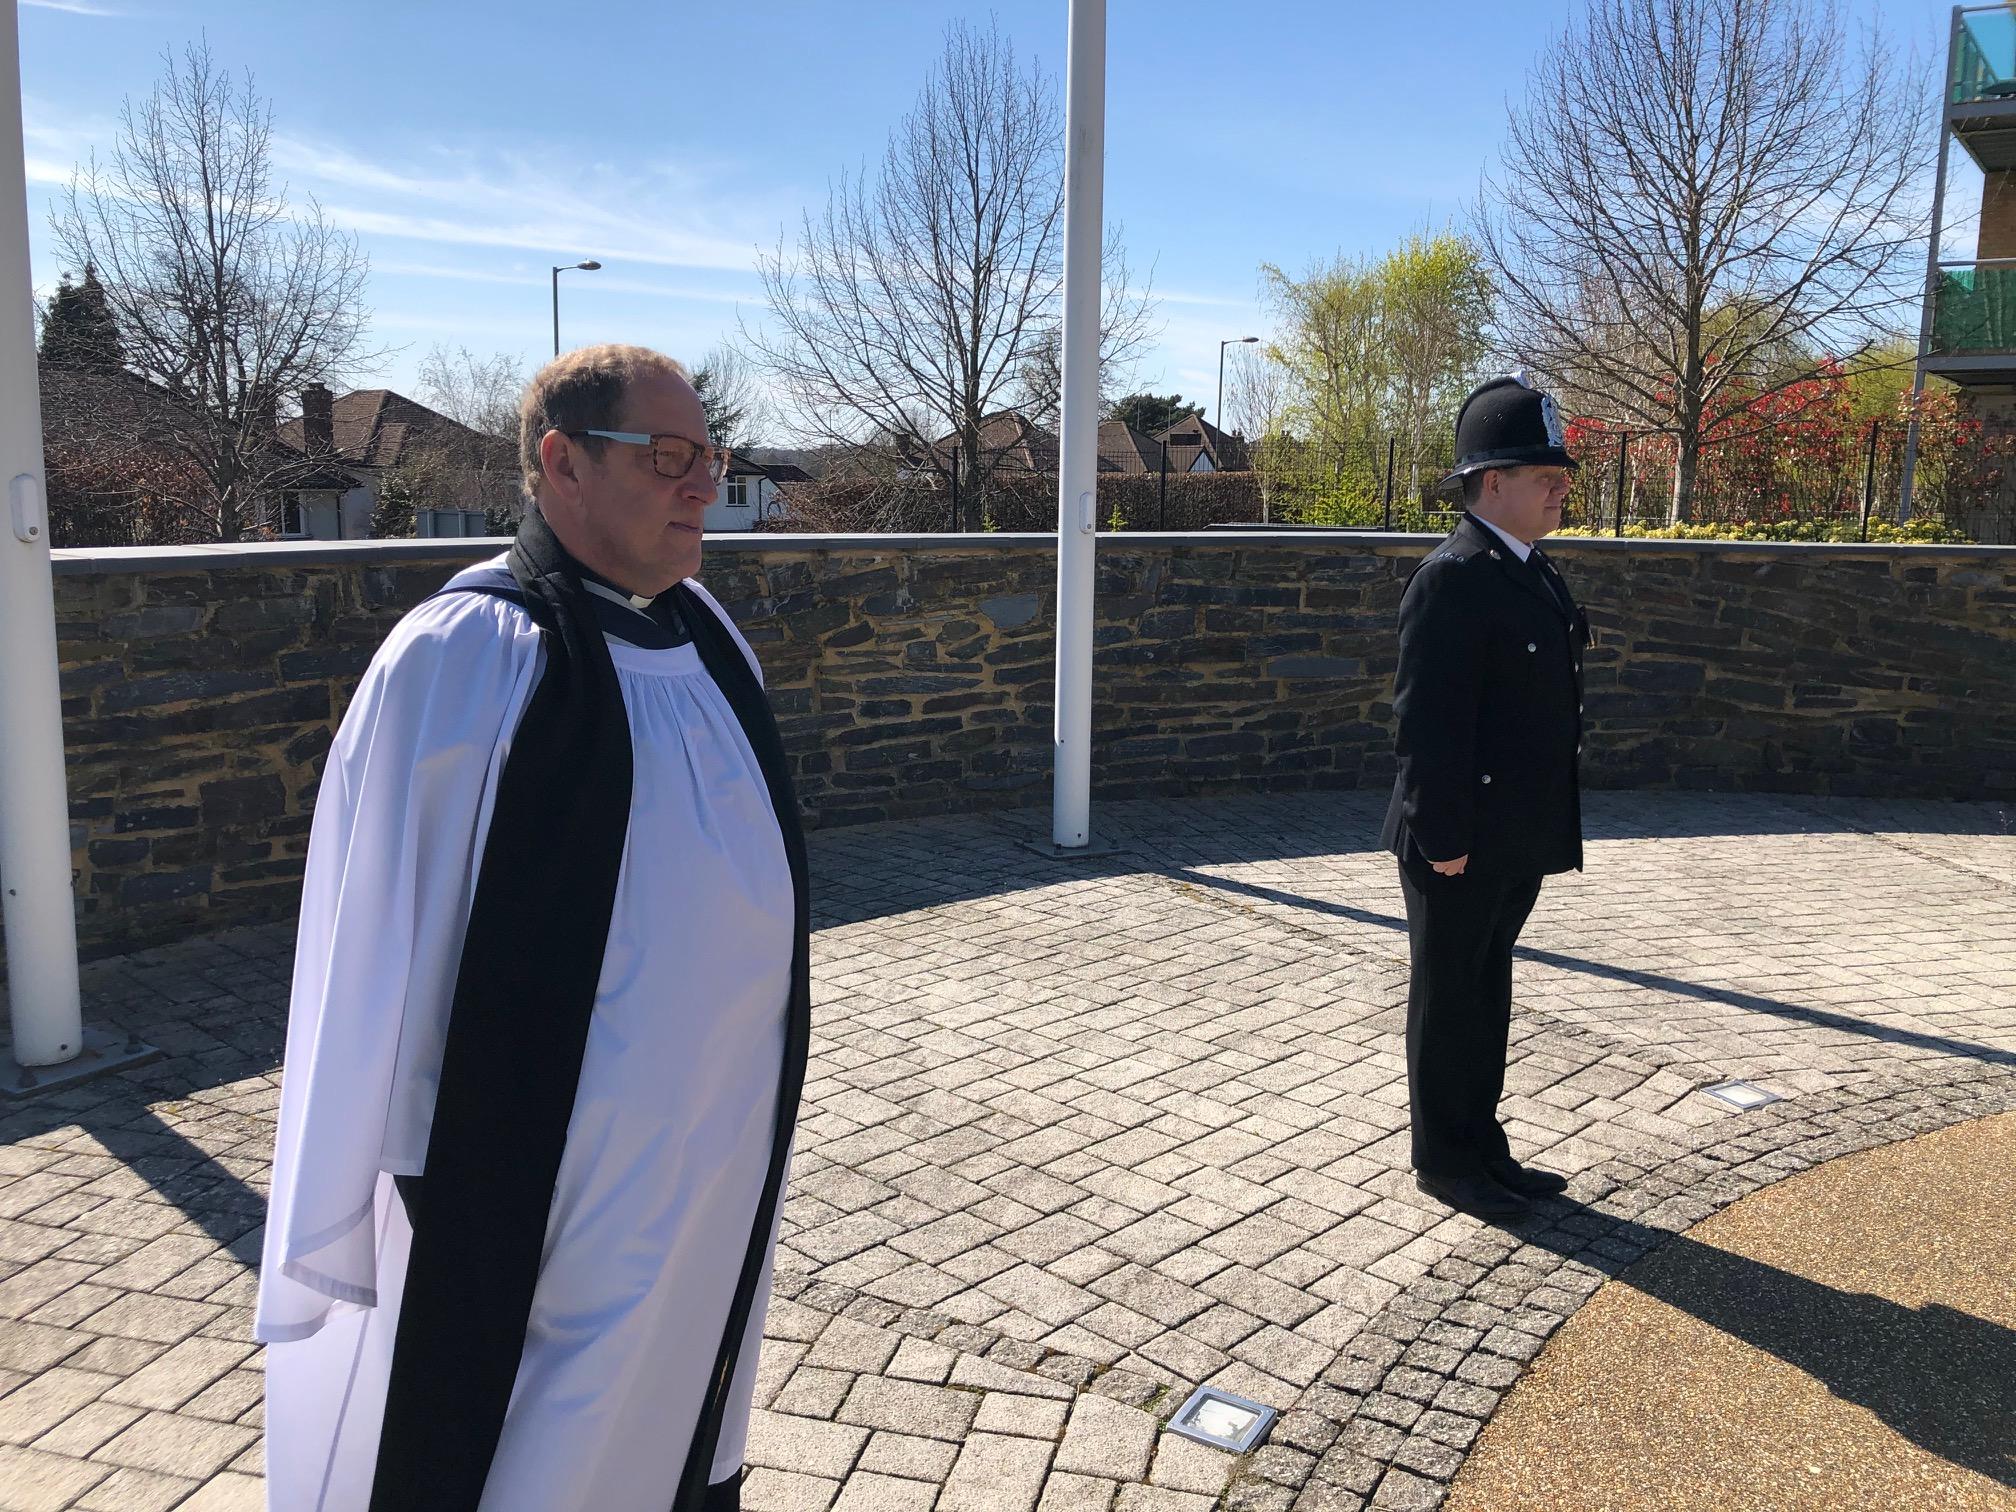 National Chaplain Observes 1 Minute Silence